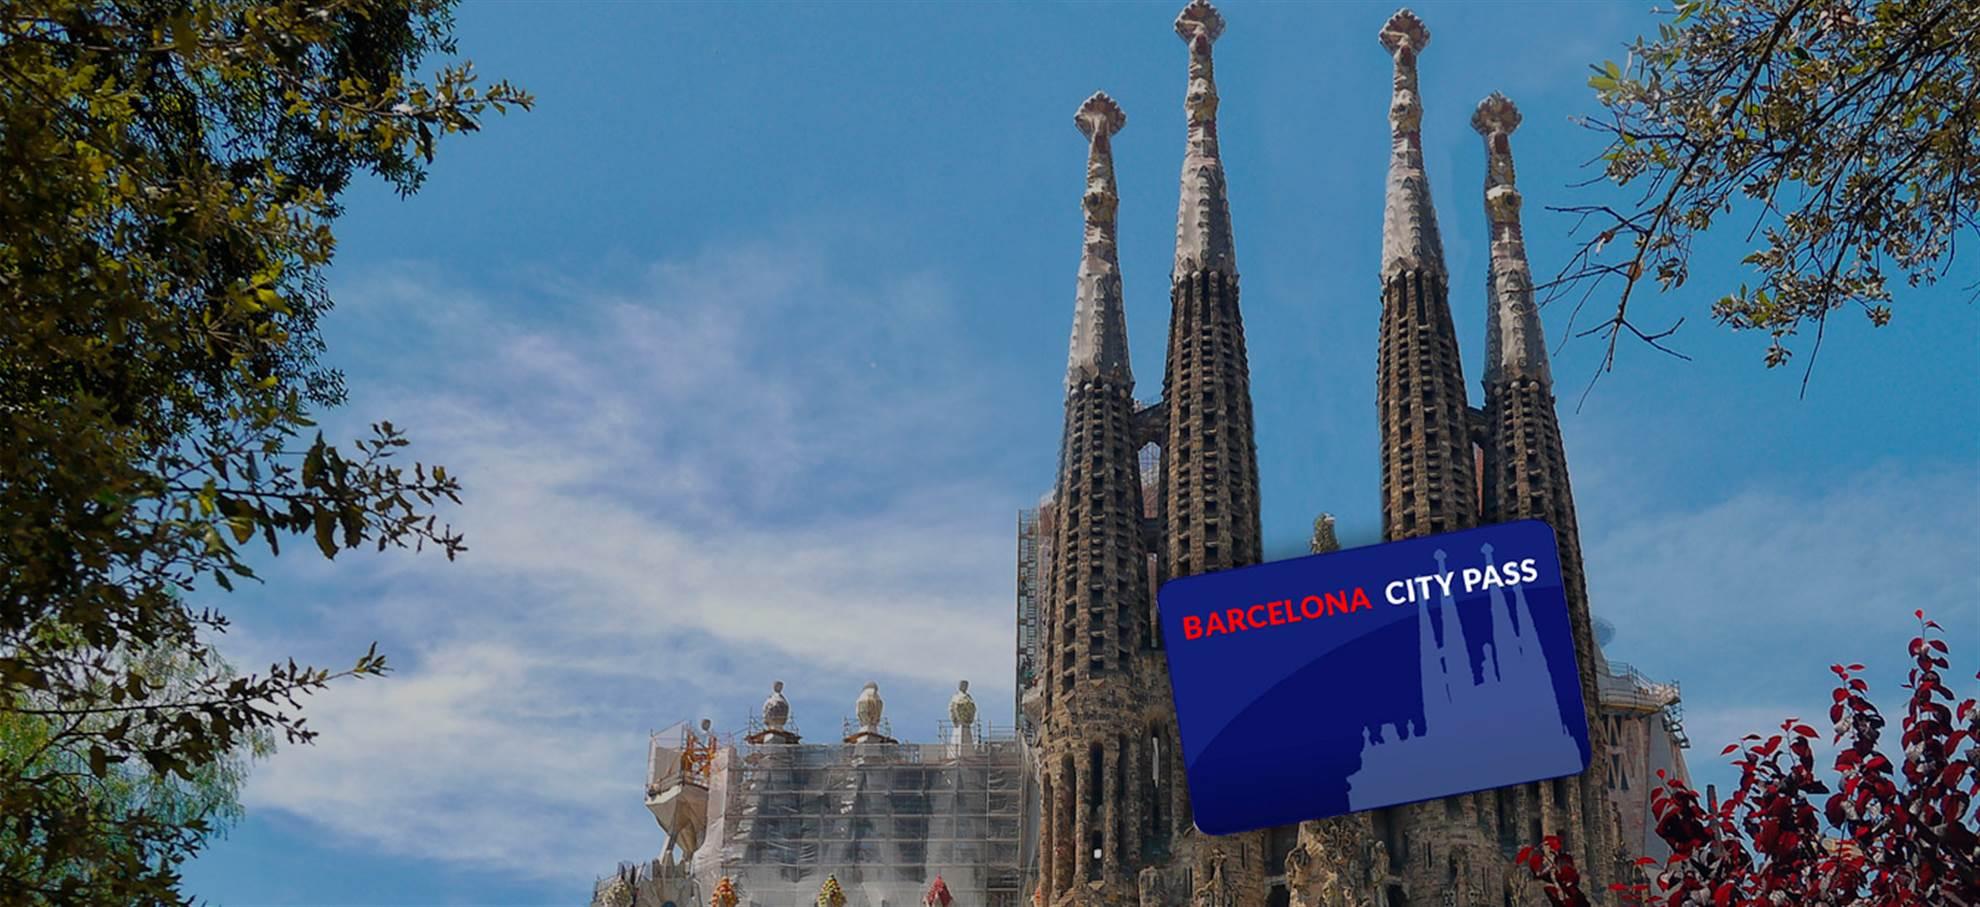 CITY PASS BARCELLONA (include Sagrada Familia e Parc Güell)